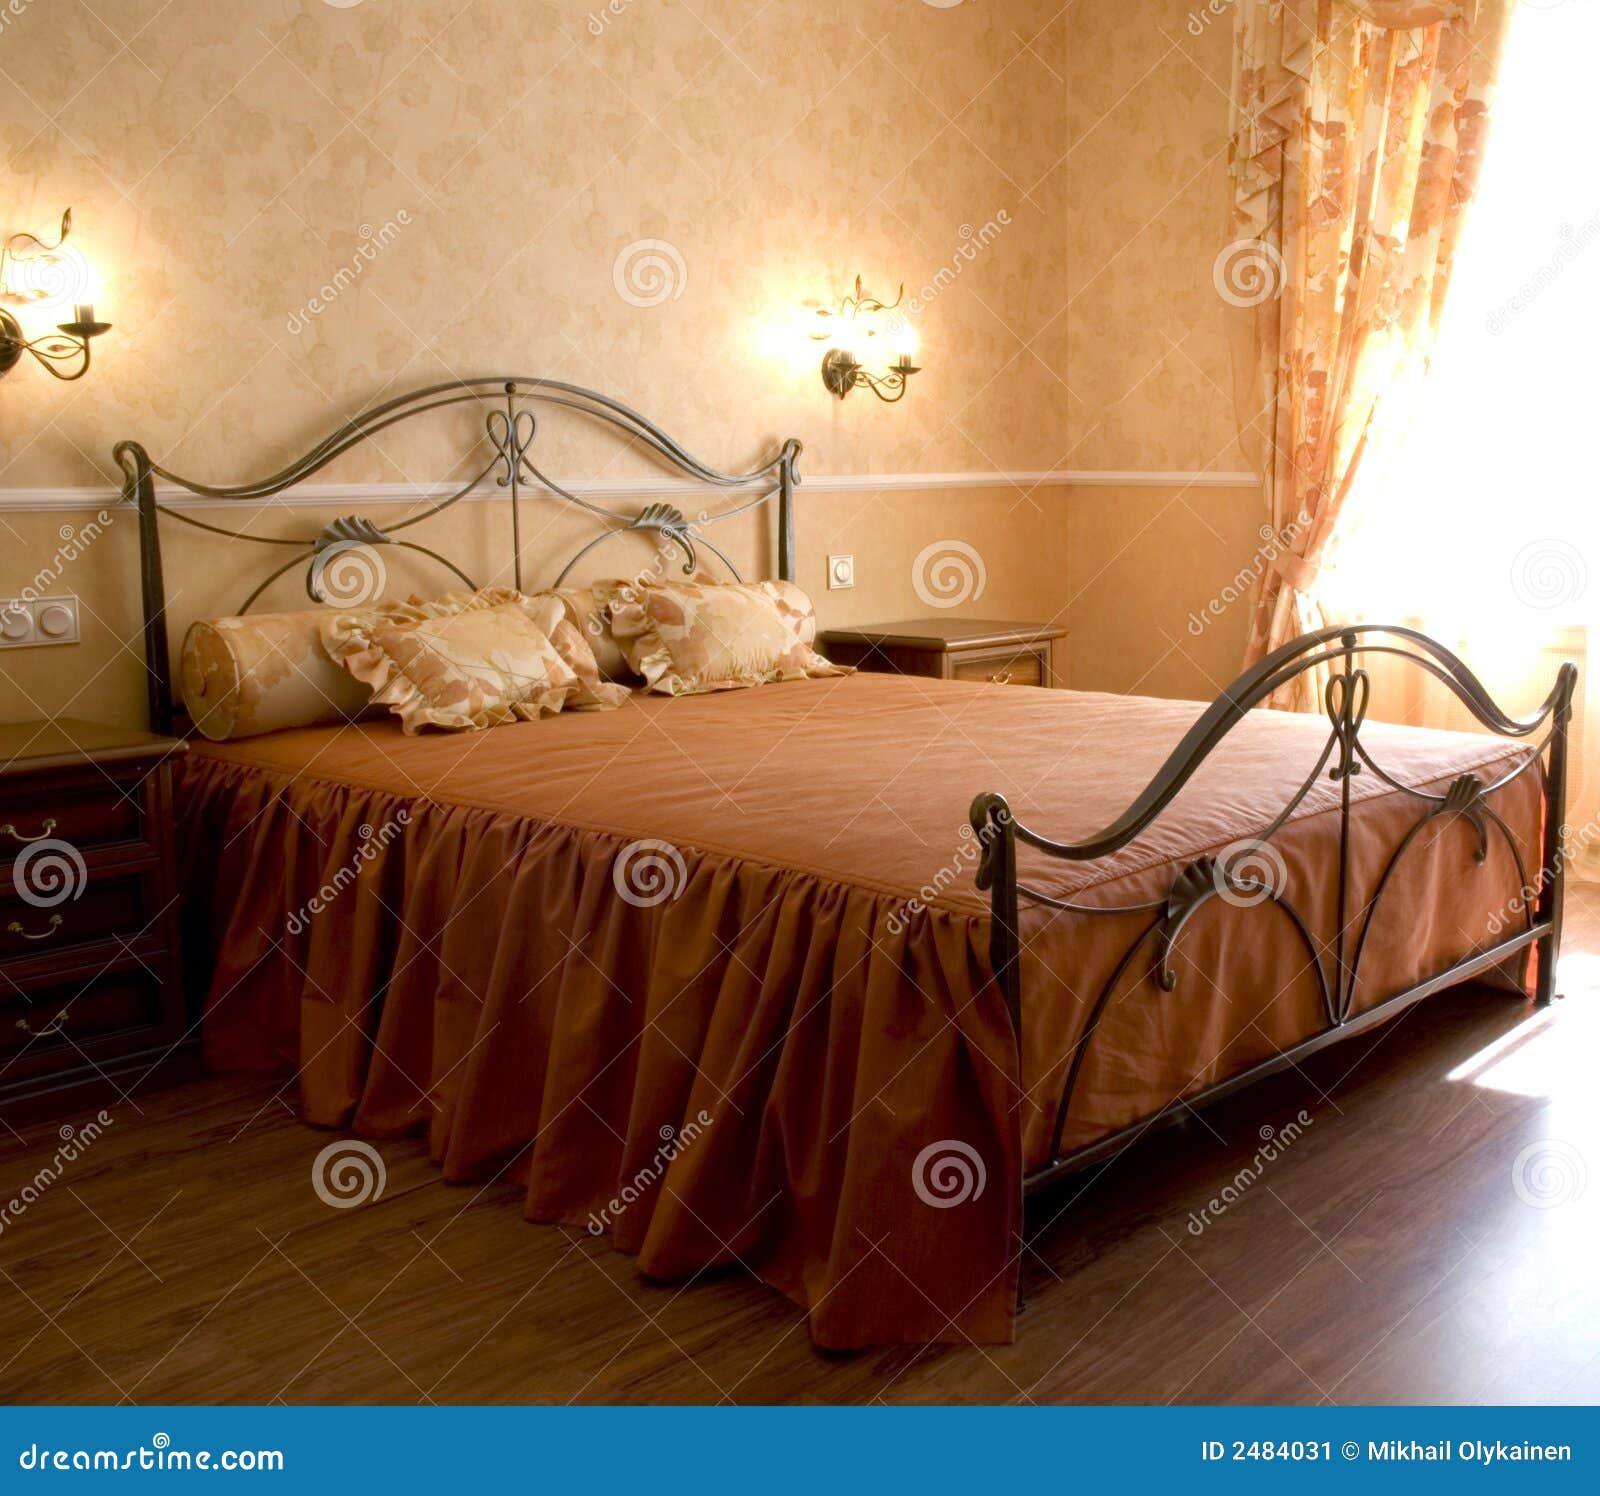 Romantische slaapkamer pvblik romantisch idee woonkamer - Romantisch idee ...